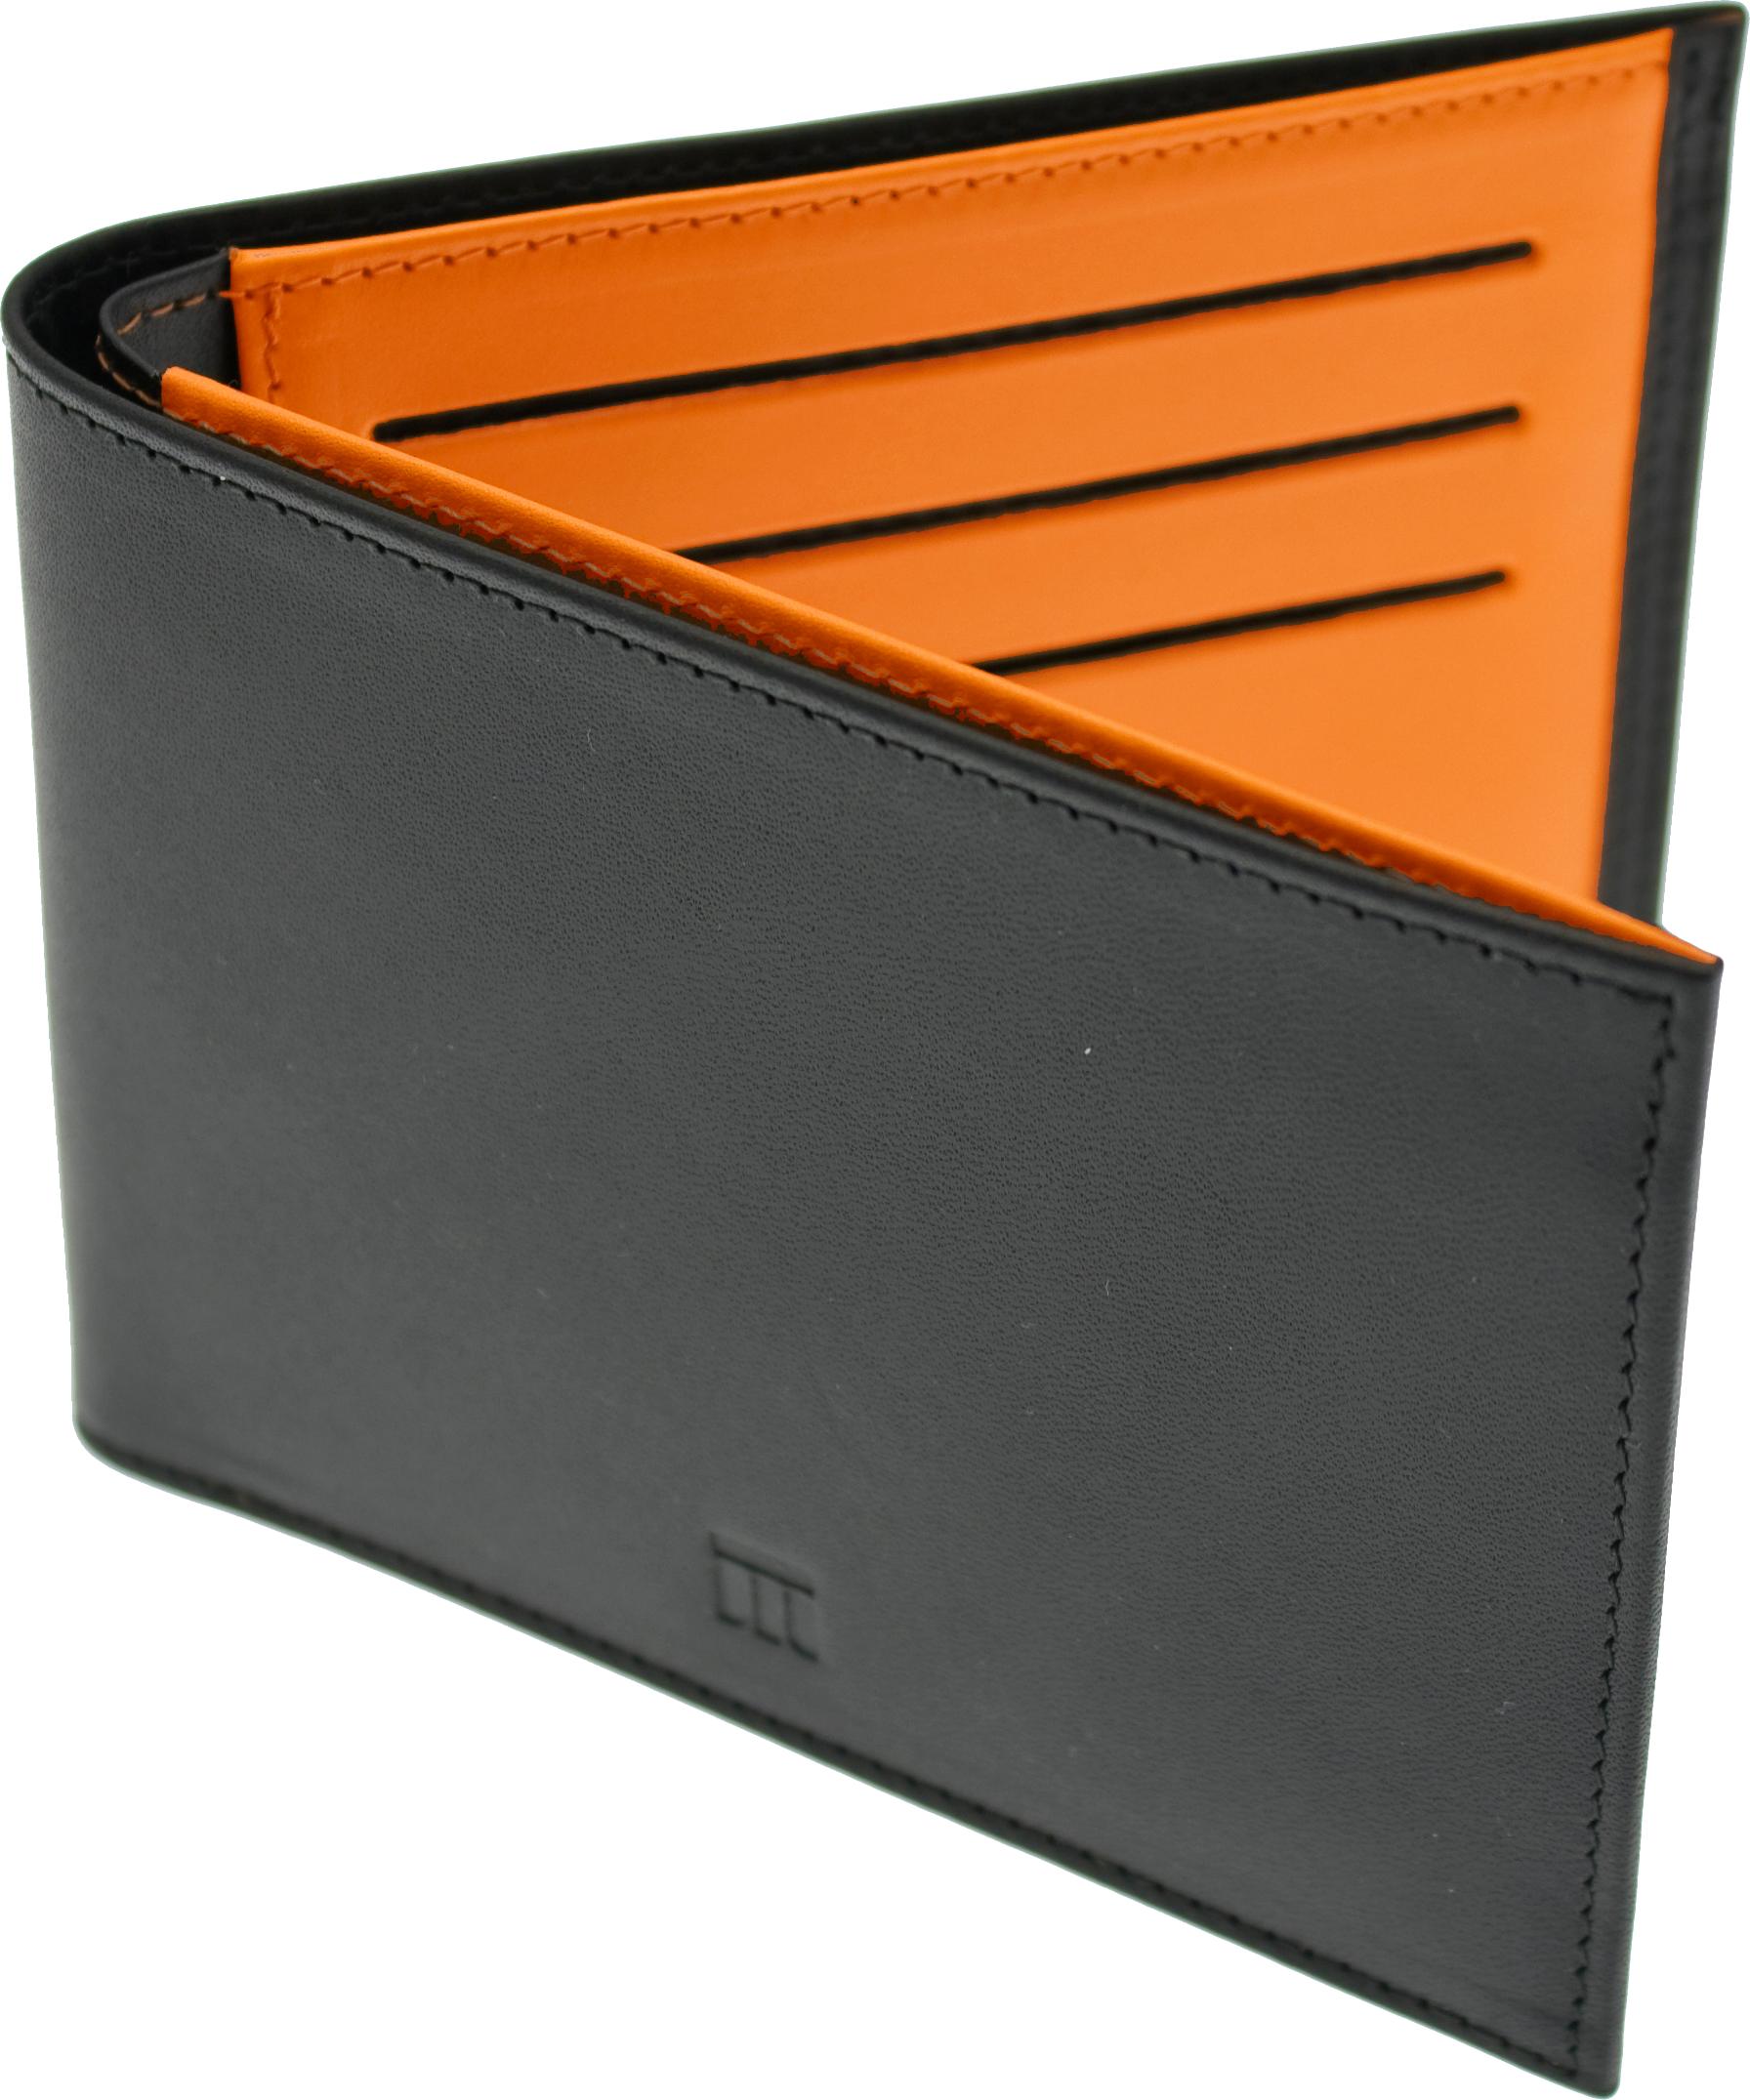 Wallet PNG - 2286